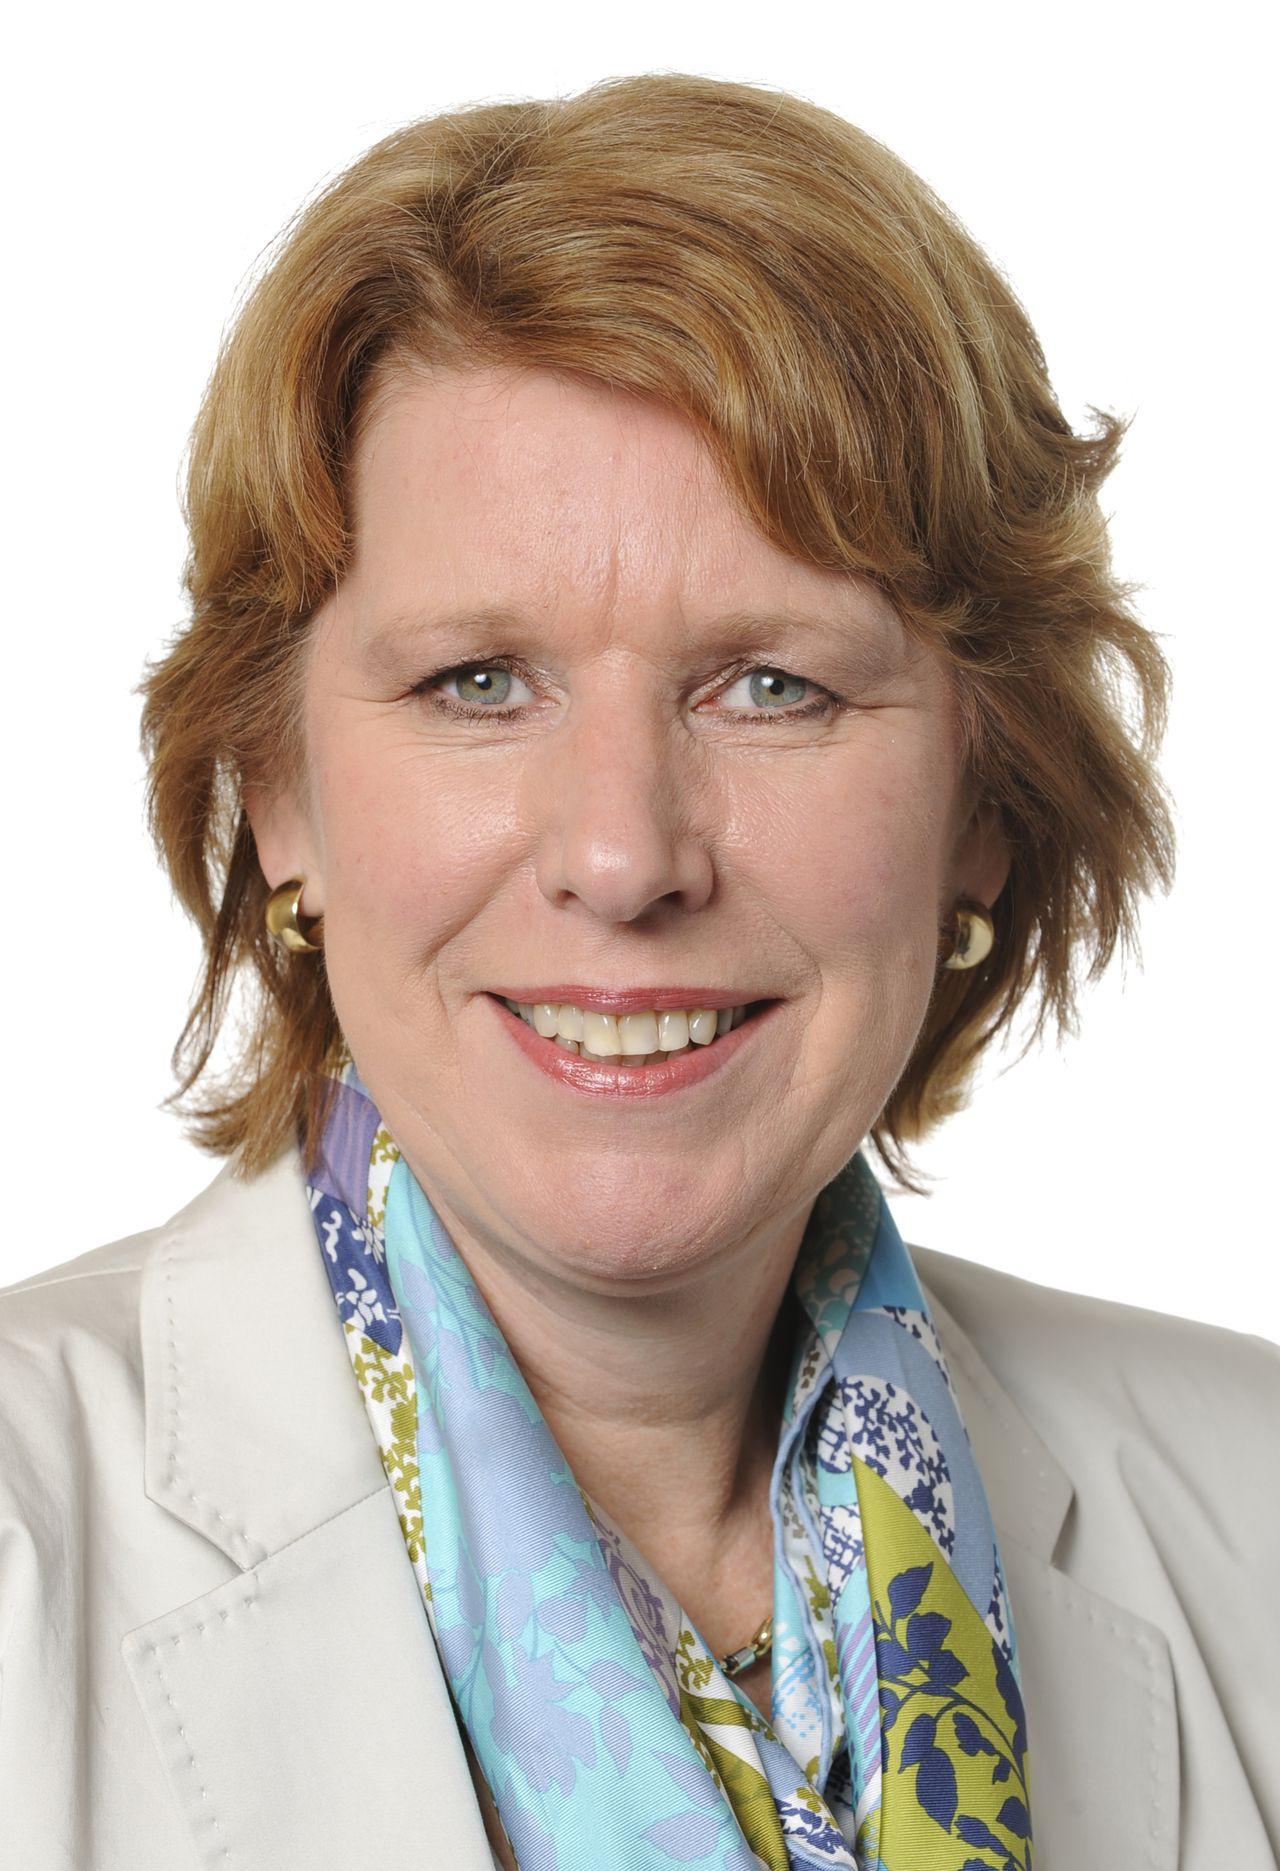 Corien Wortmann-Kool lid Europees Parlement CDA / Europese Volkspartij 2009 FOTO: Europees Parlement